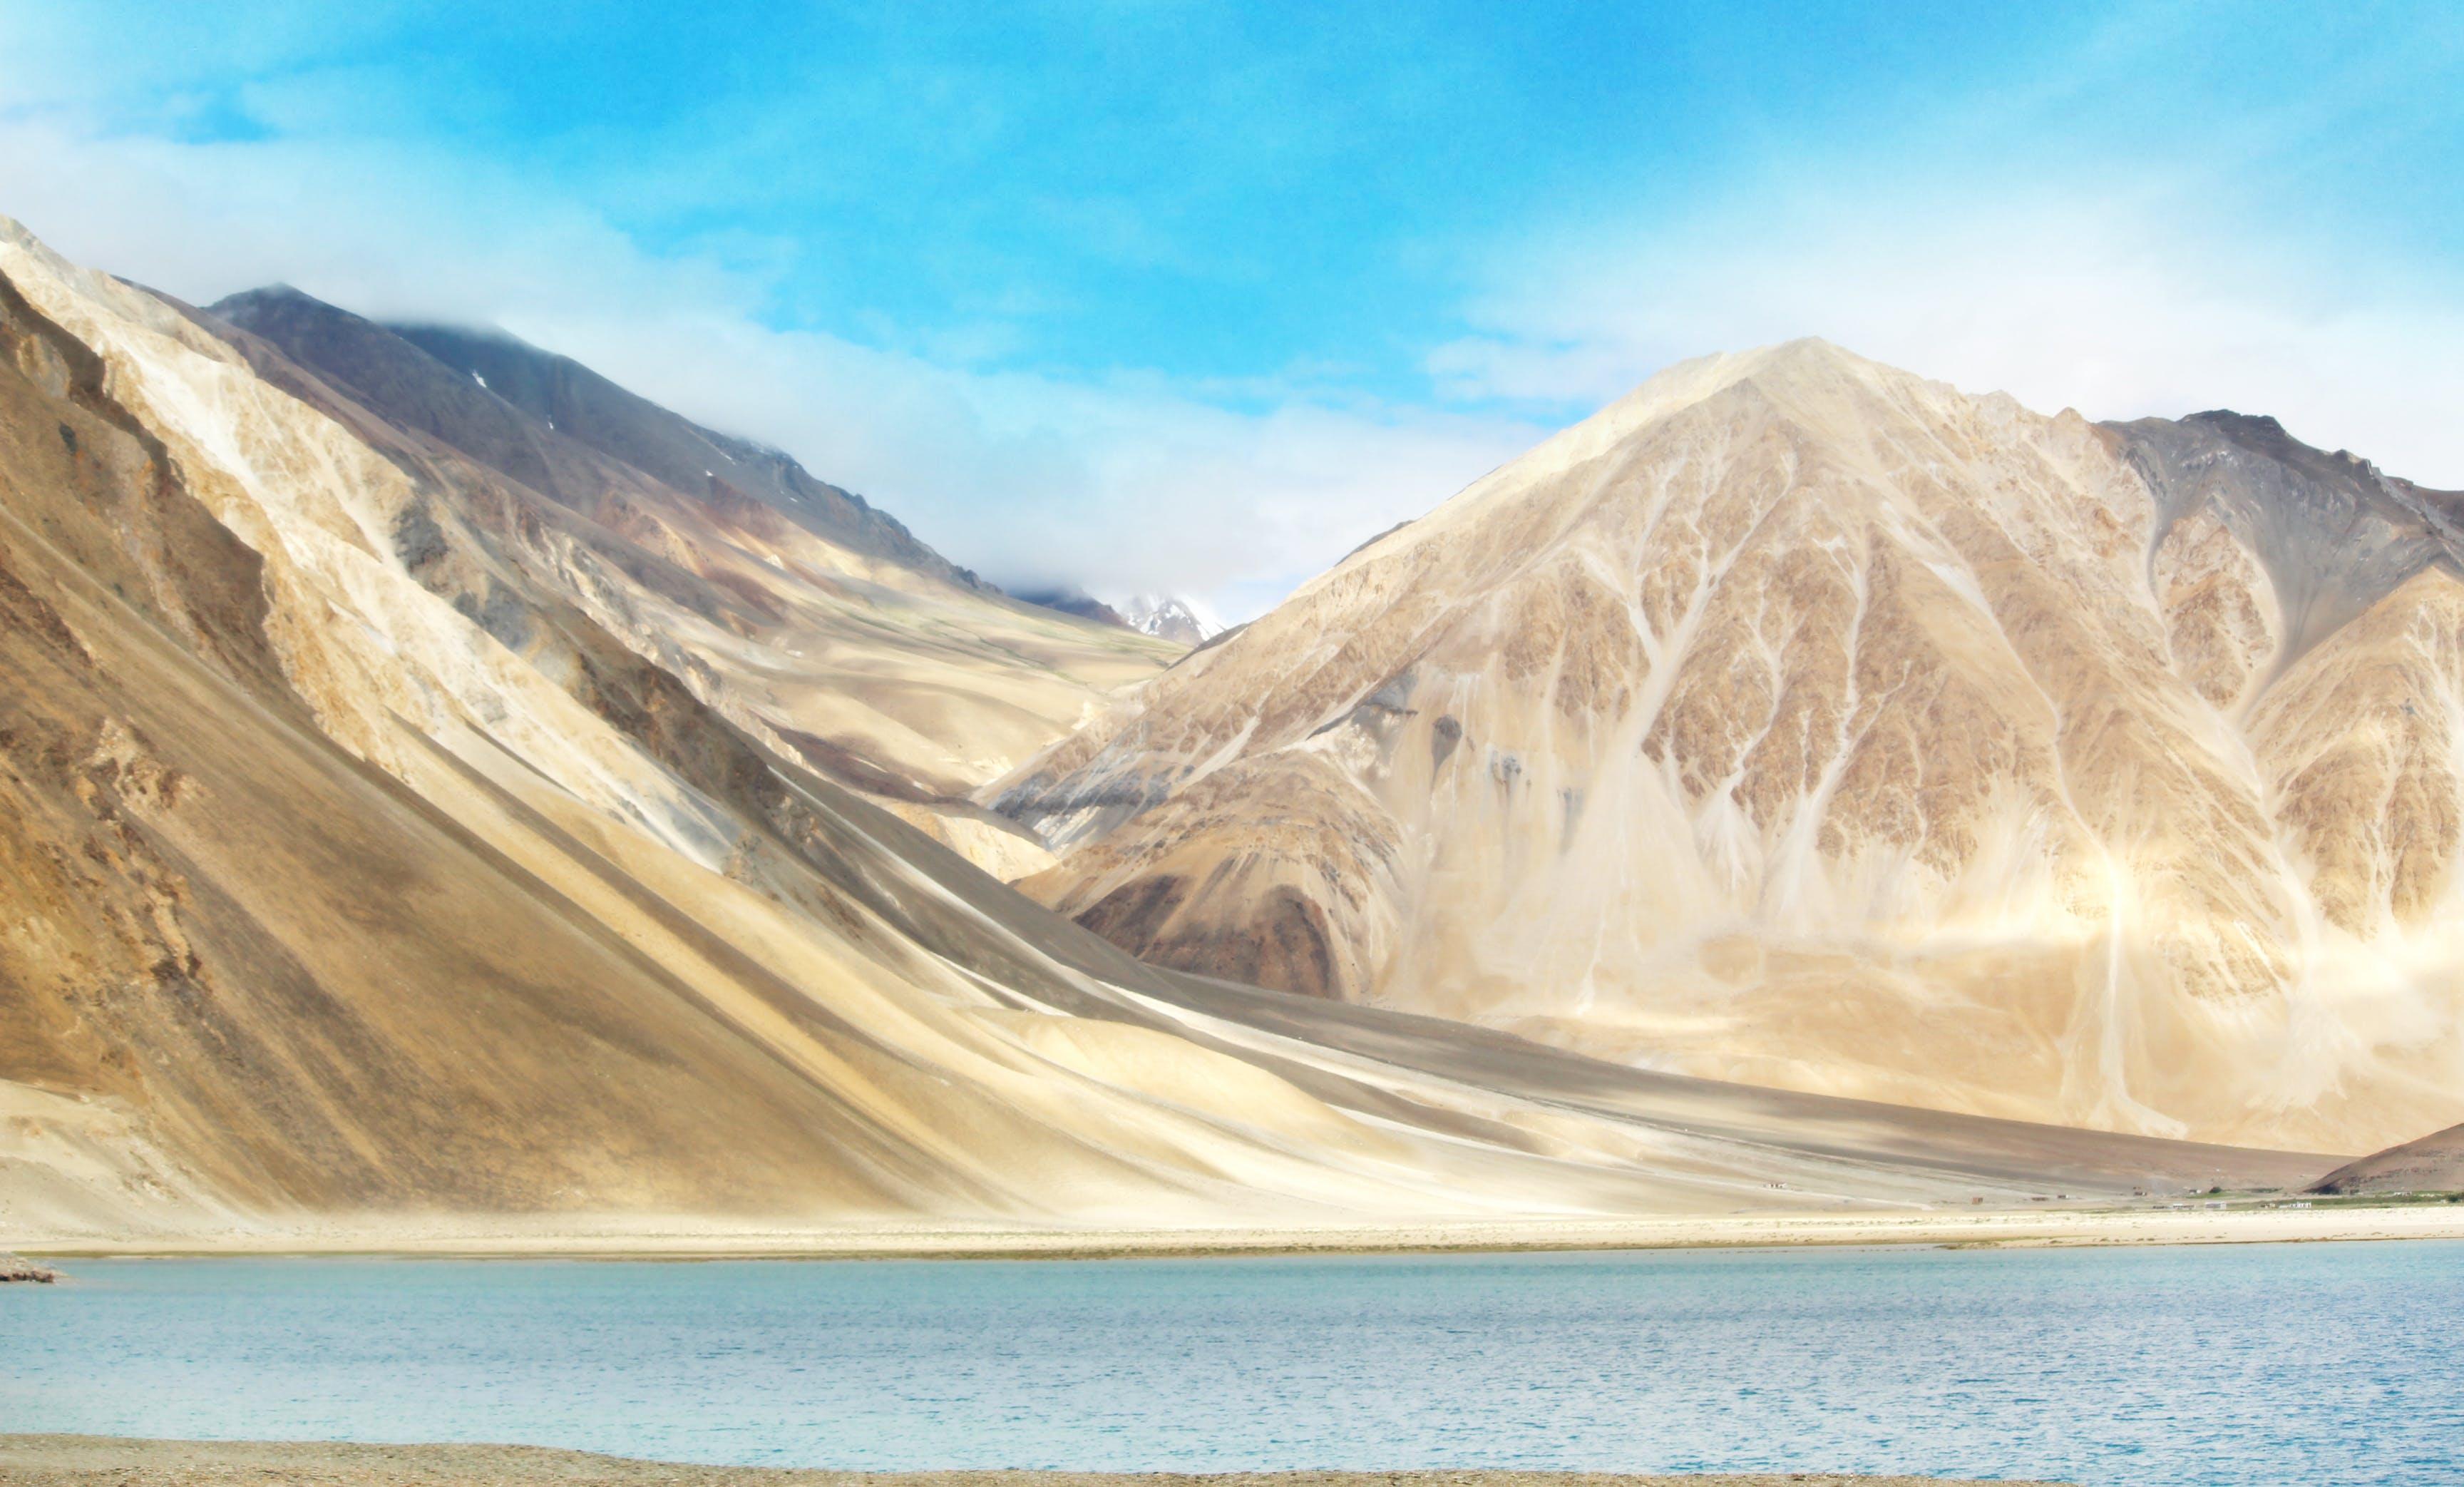 Gratis stockfoto met bergen, daglicht, h2o, hemel